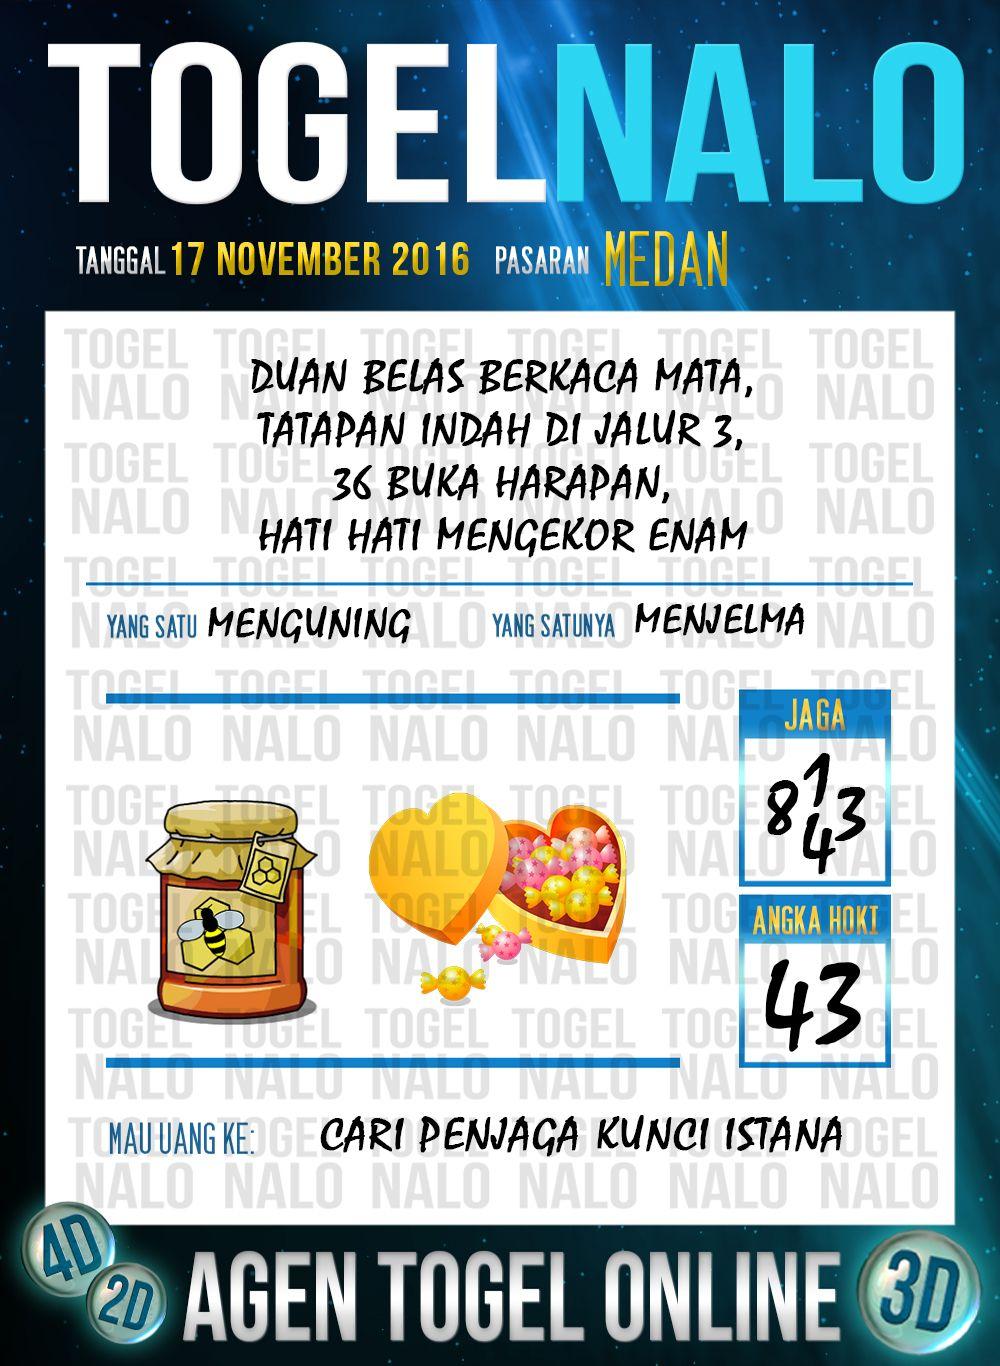 Angka Jp 2d Togel Wap Online Live Draw 4d Togelnalo Medan 17 November 2016 17 November November Desember